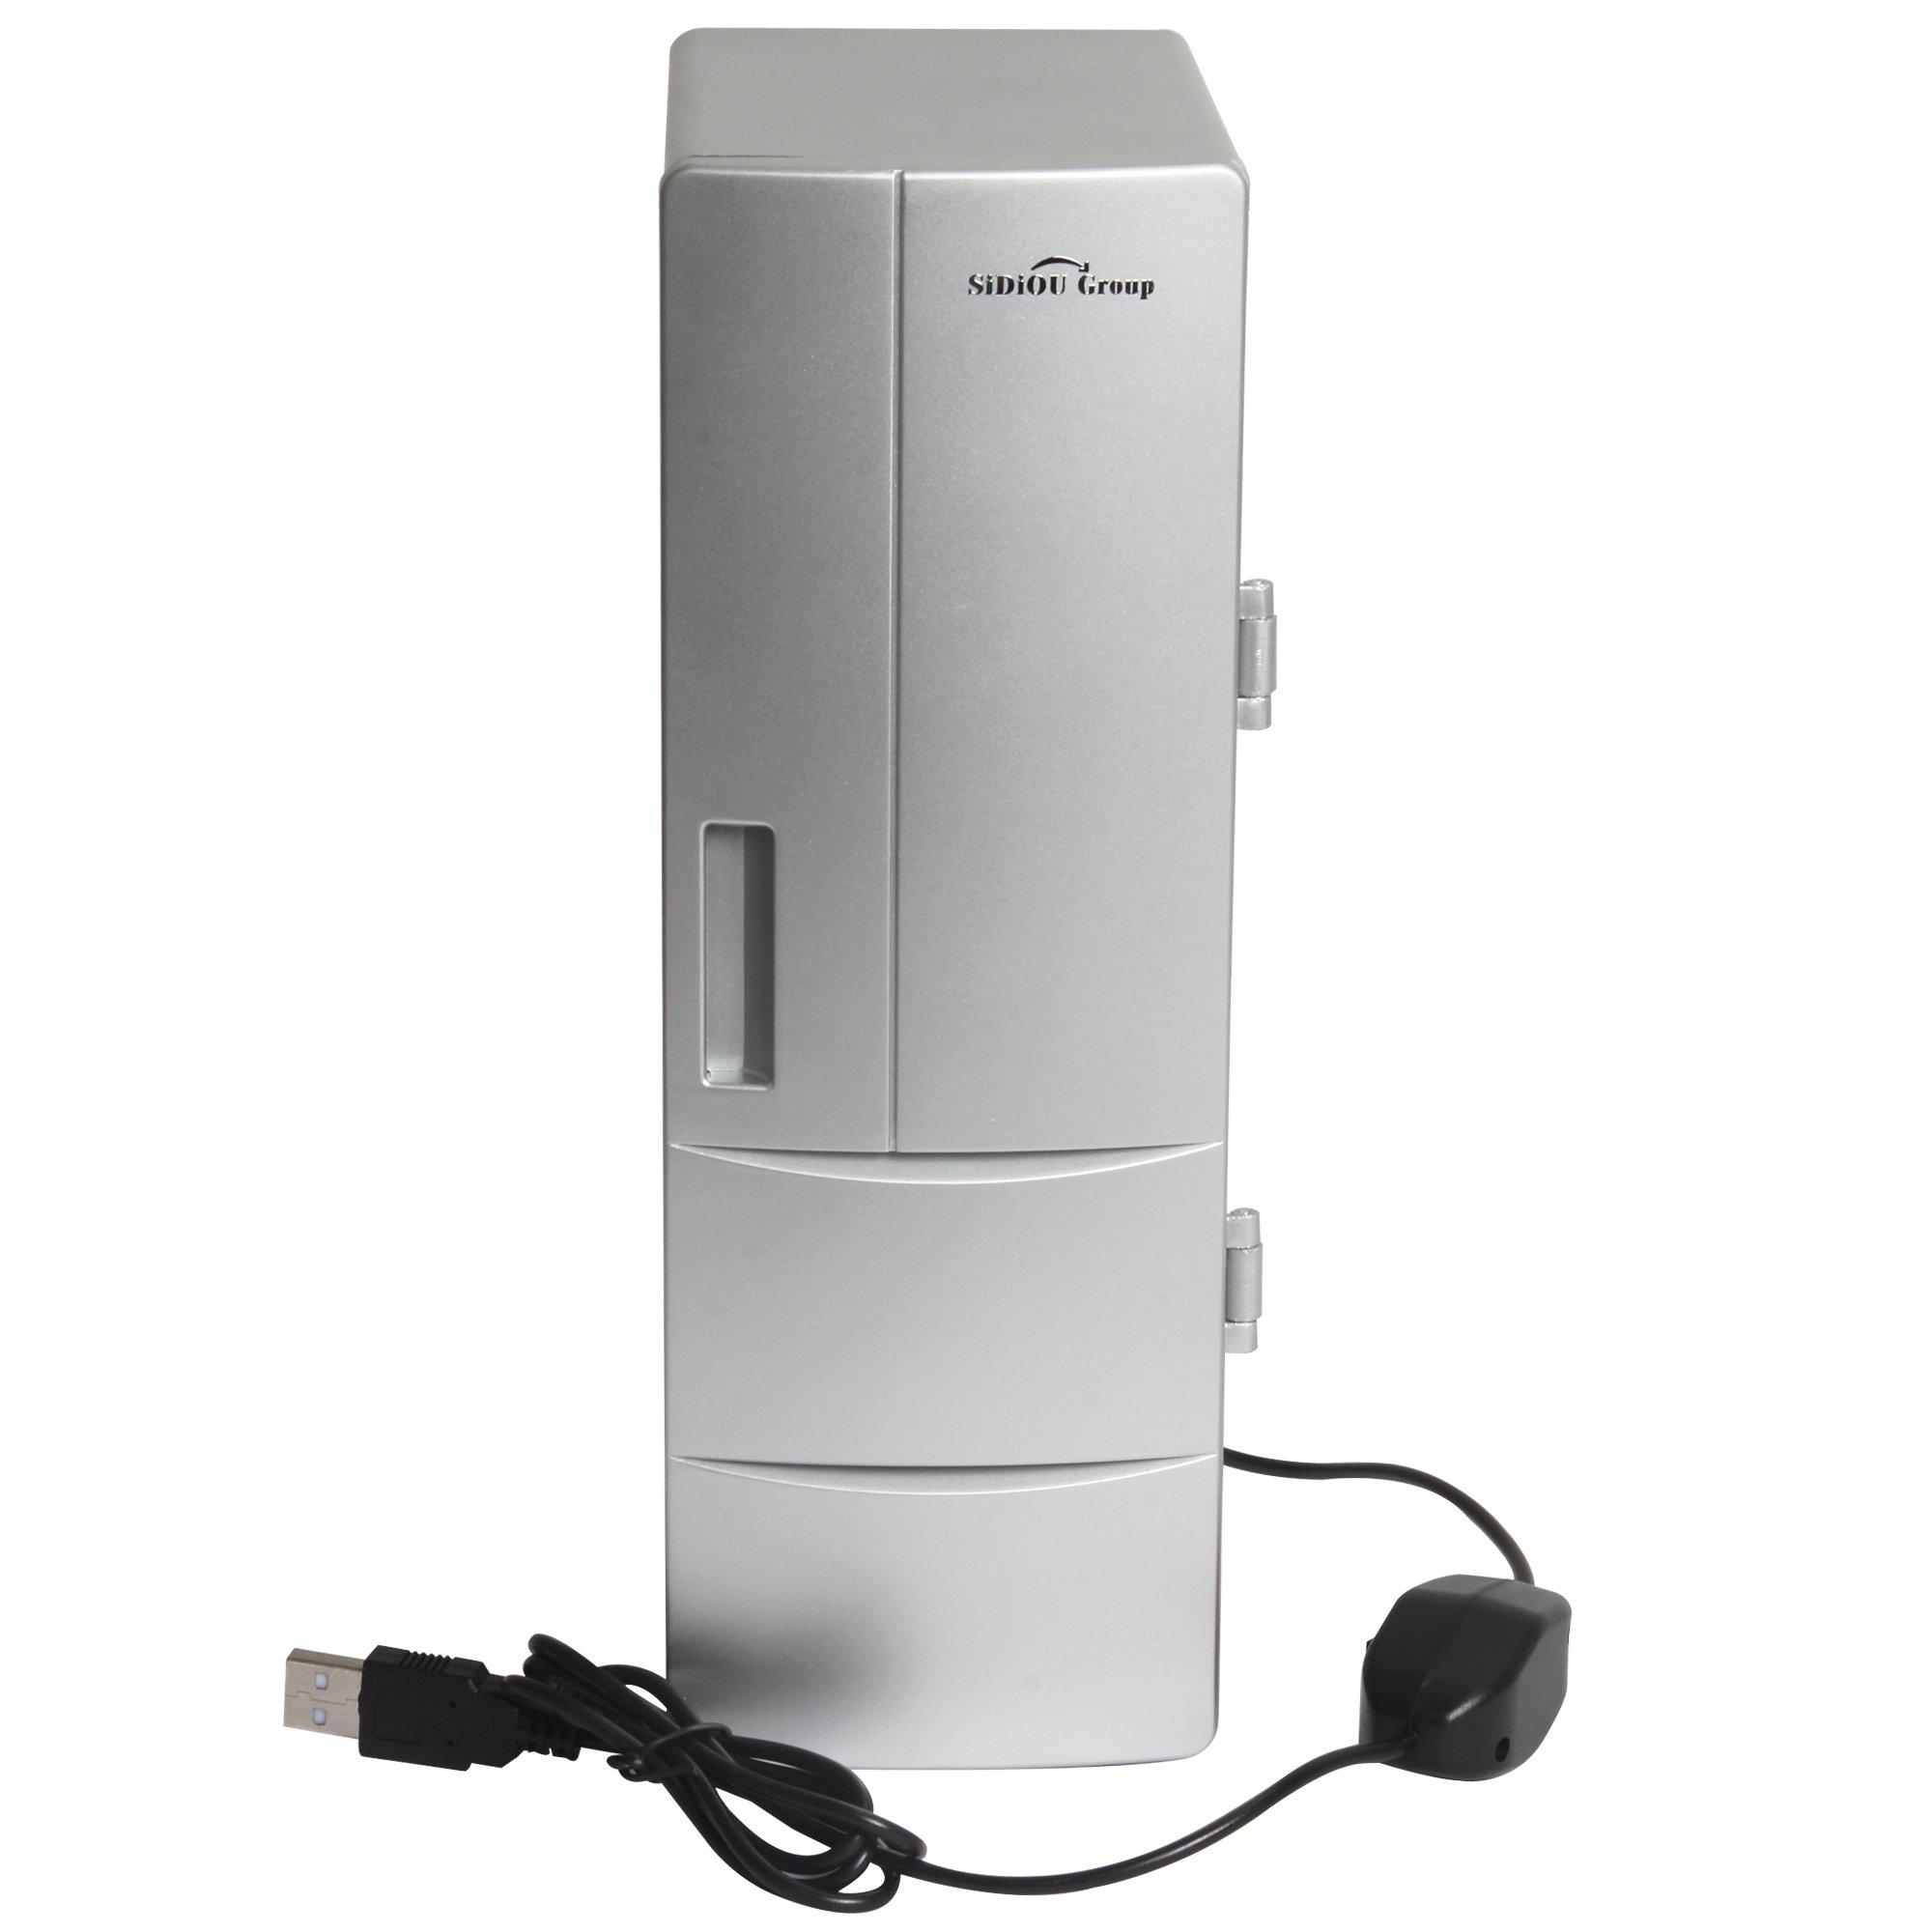 Sidiou Group USB small refrigerator Medium fridge USB mini fridge freezer drinks Cooling And Heating Dual purpose Portable Refrigerator